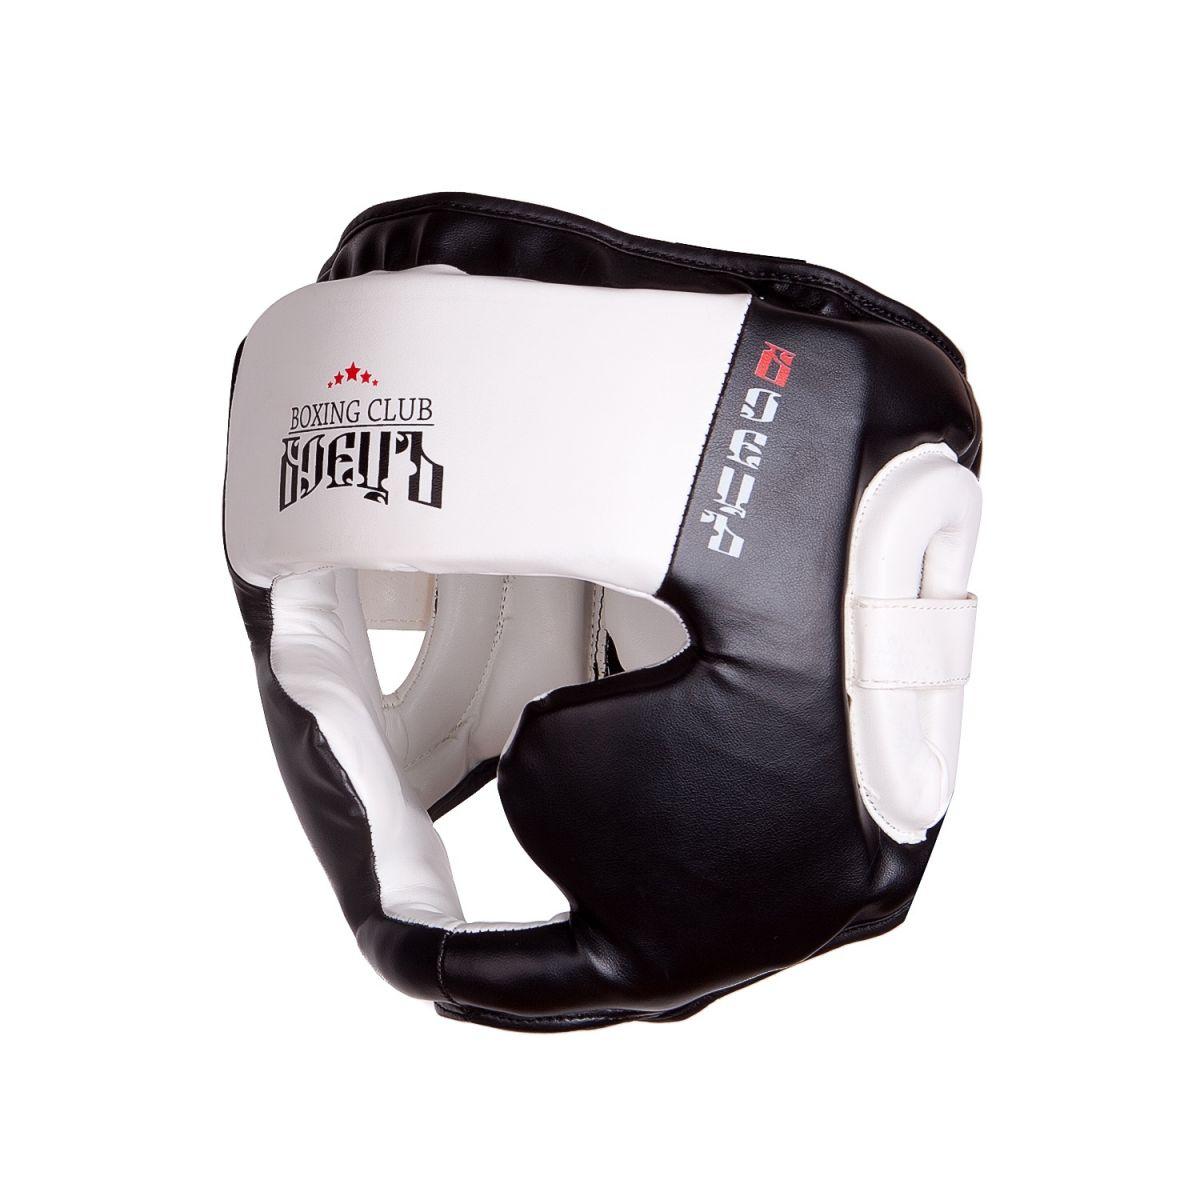 Шлем боксерский BHG 23 Чёрный/Белый, размер S